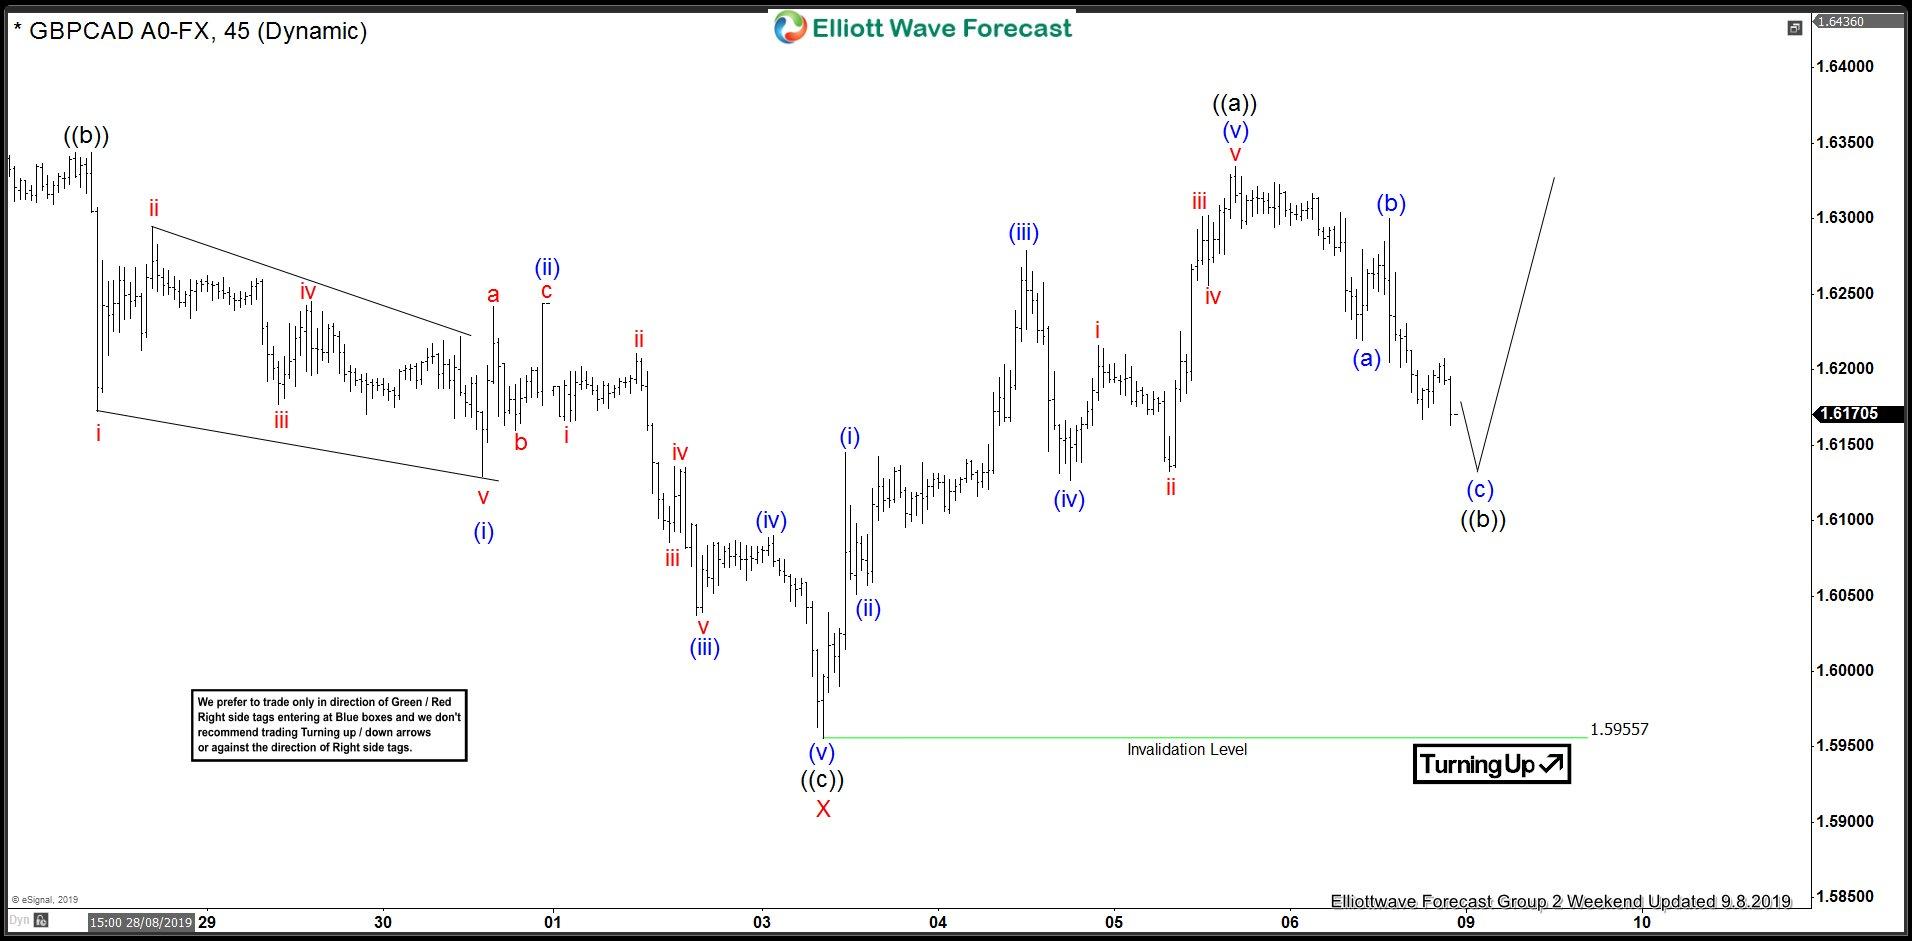 GBPCAD : Bullish Elliott Wave Count + Bullish Market Breakout Patterns